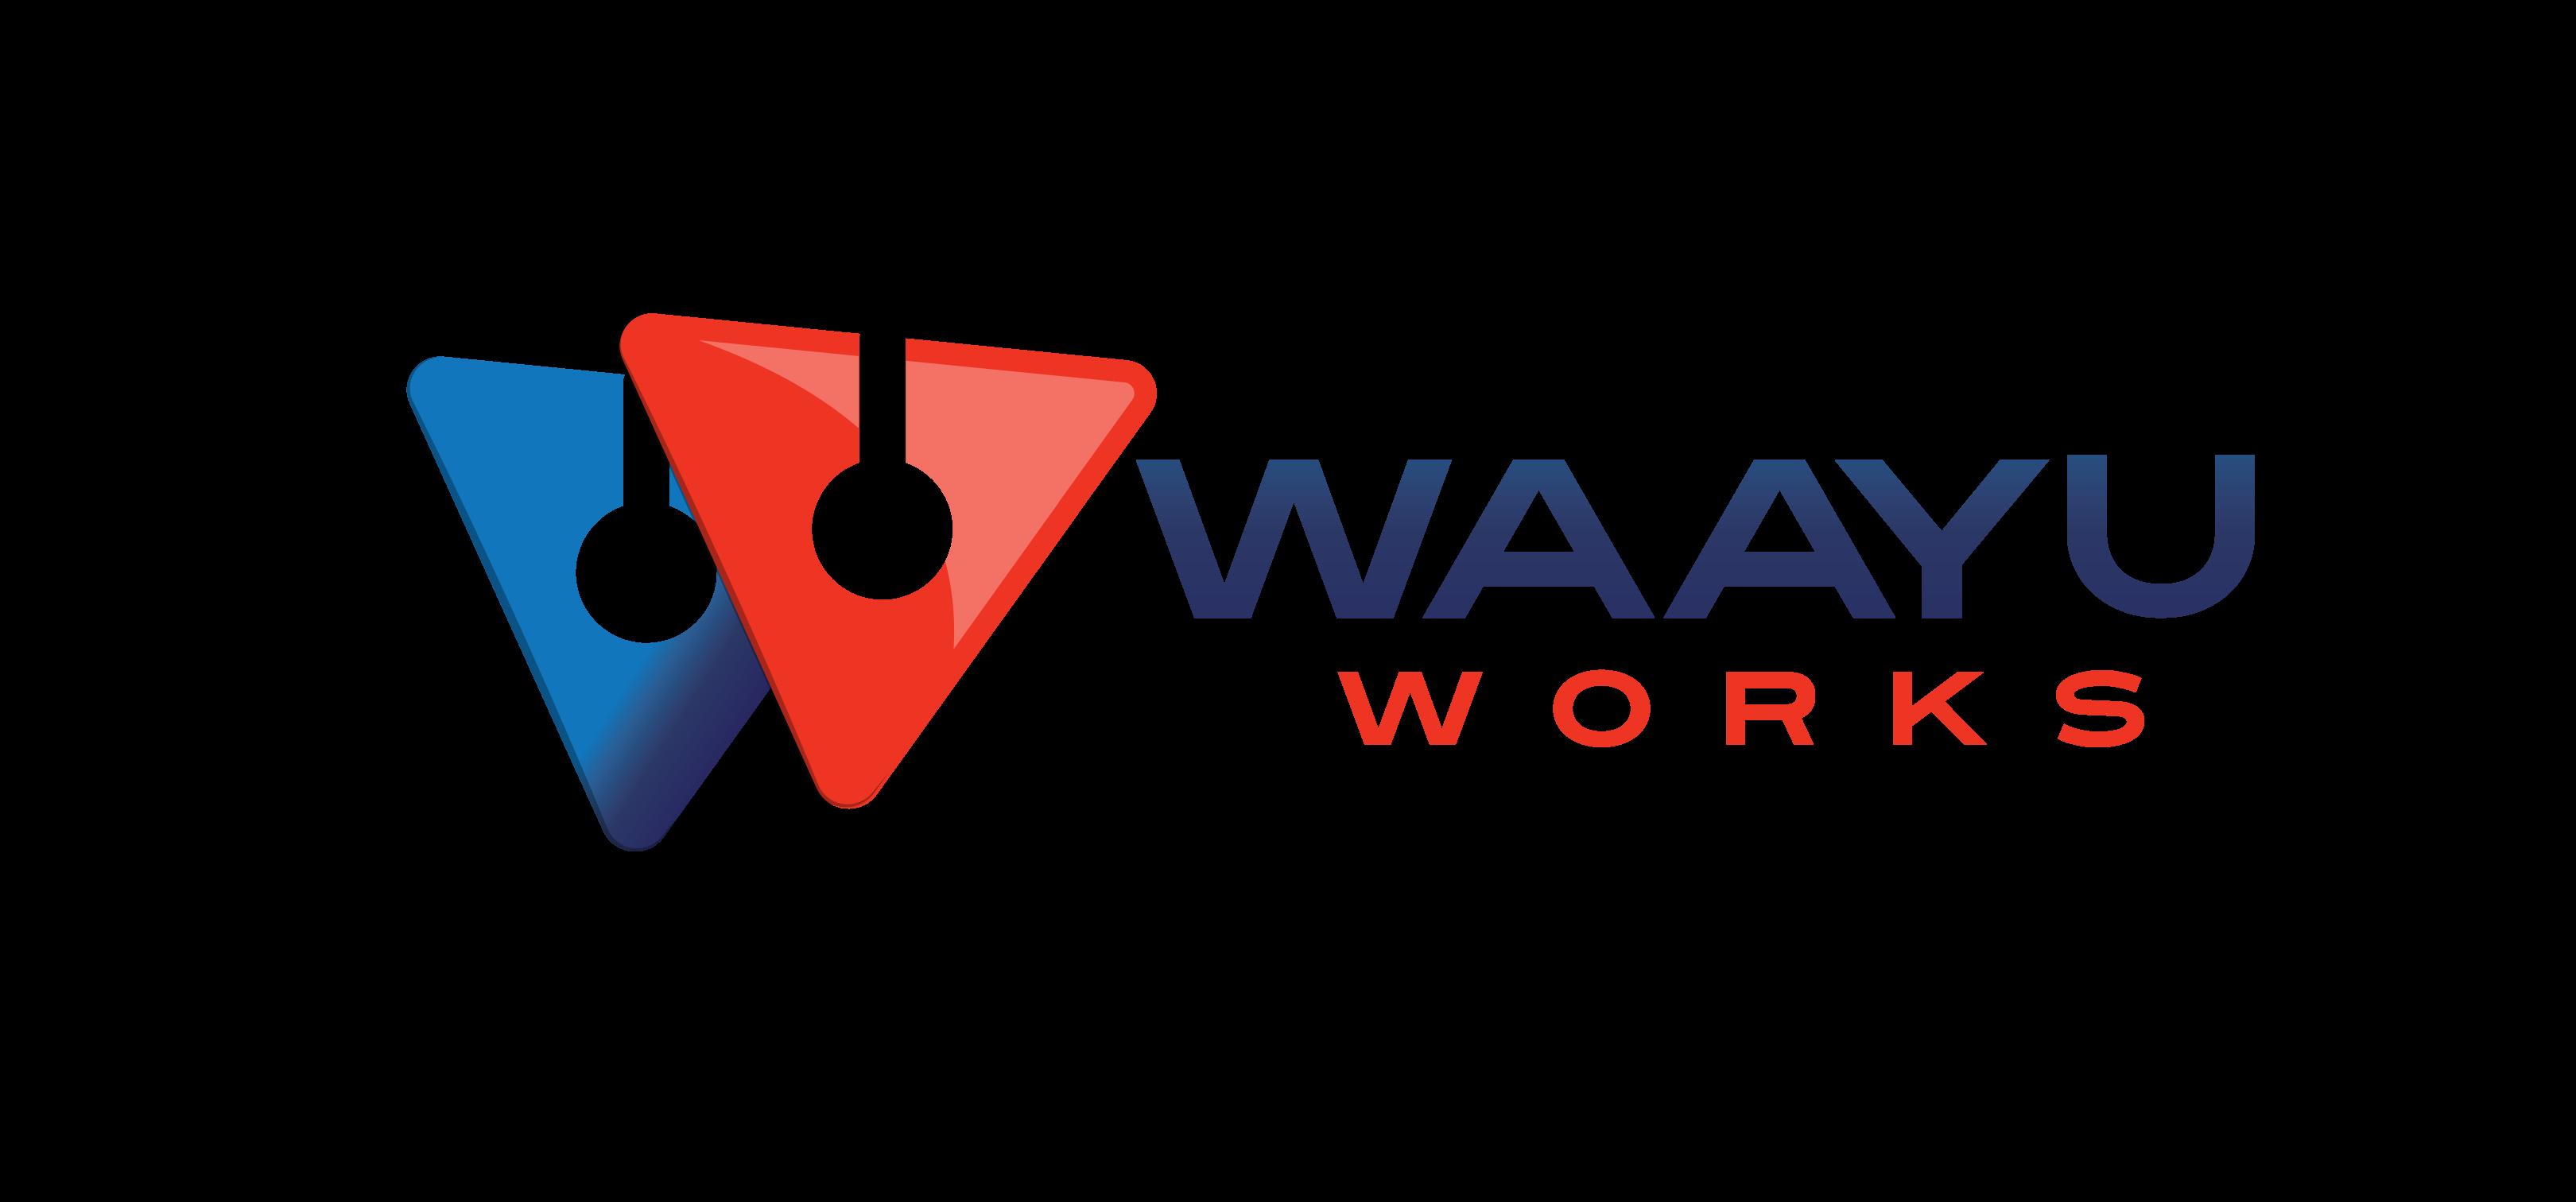 Waayu Works